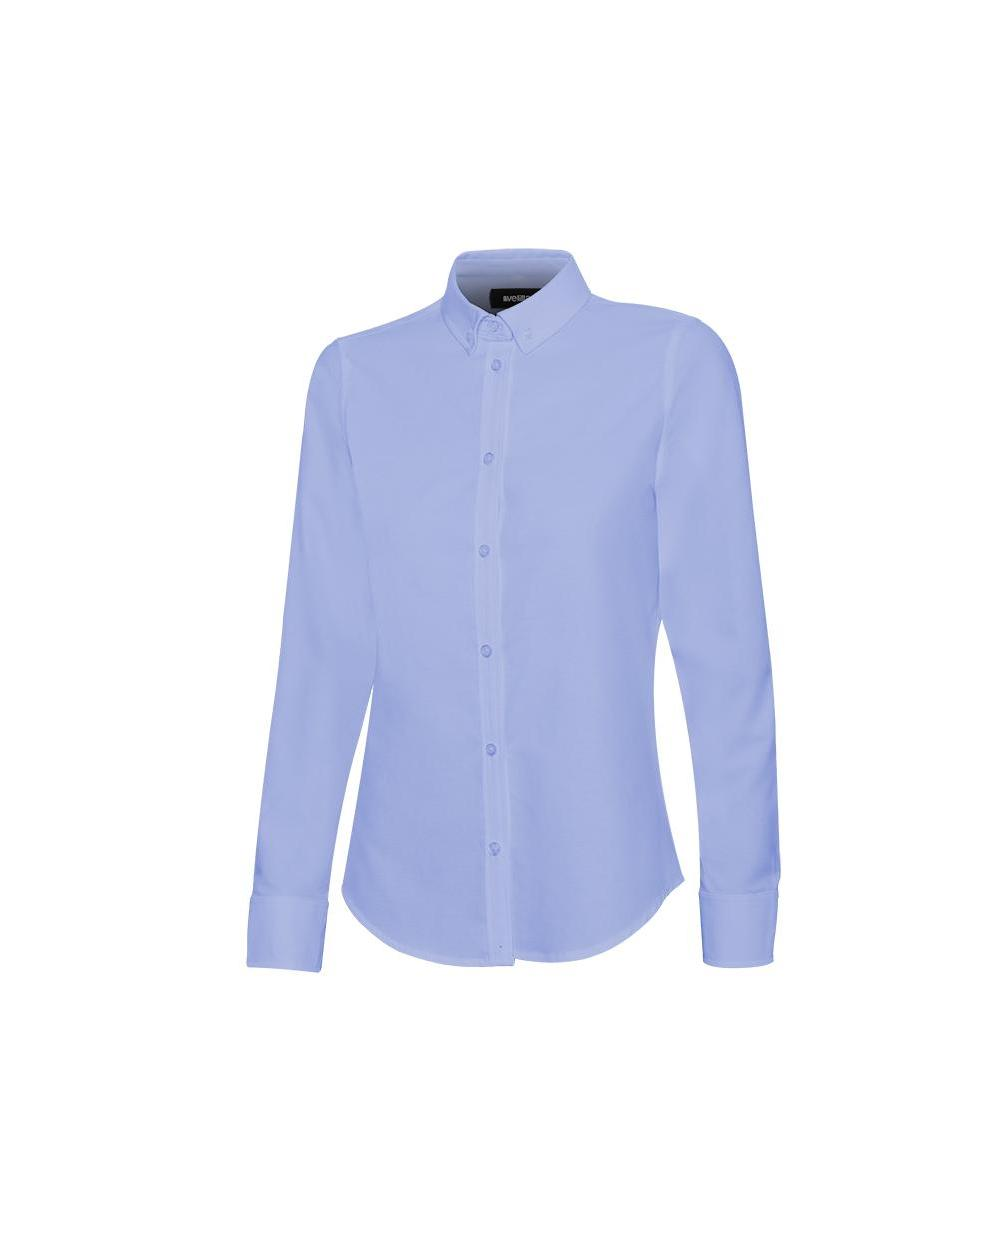 Comprar Camisa oxford stretch manga larga mujer serie 405005s online barato Celeste